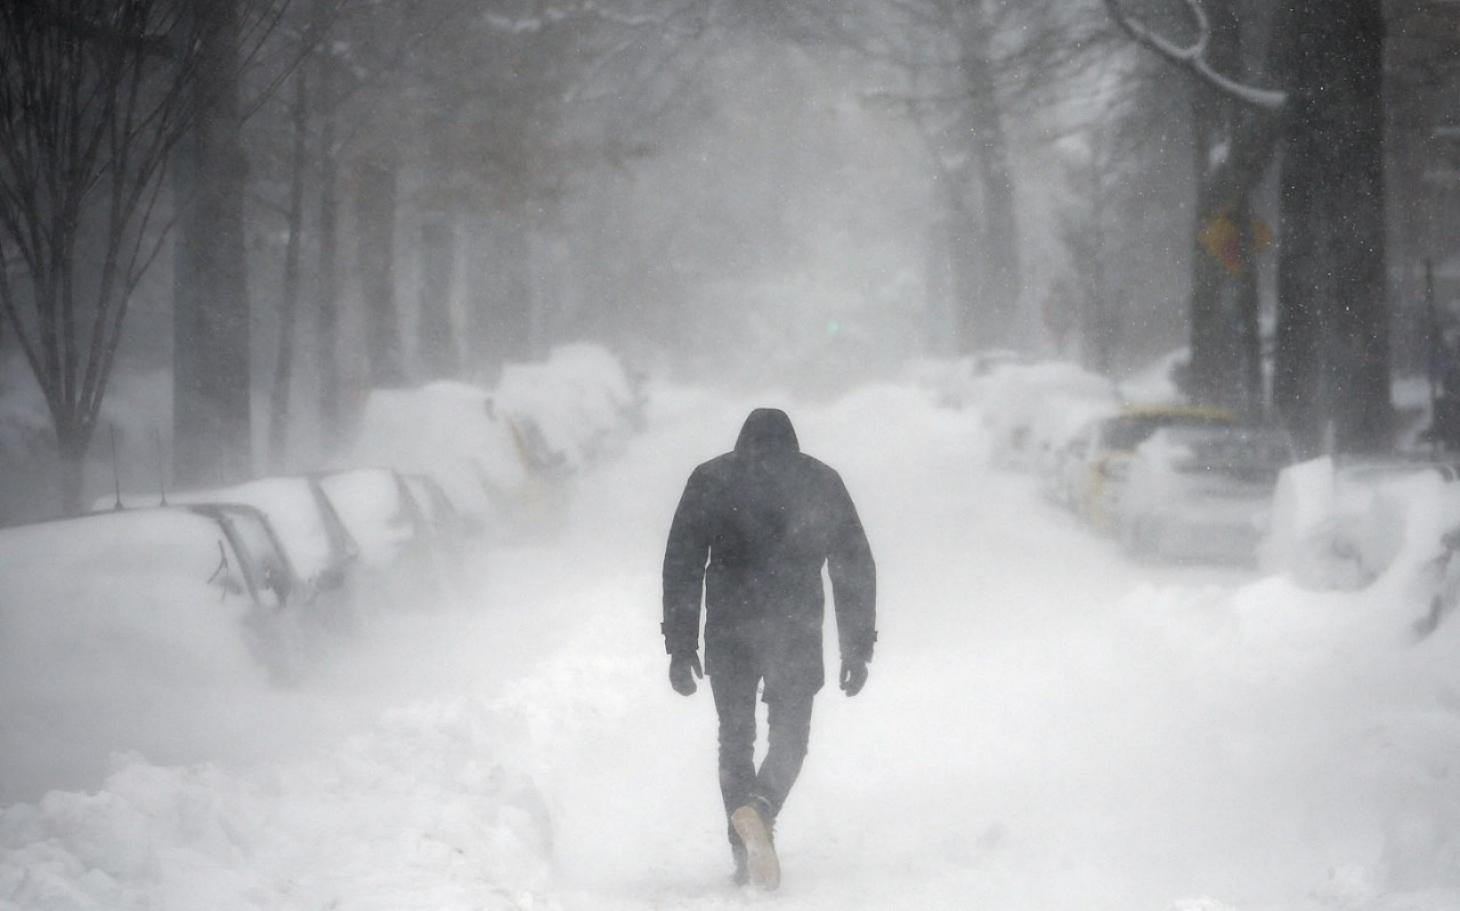 blizzard with hurricane winds hits east coast al jazeera